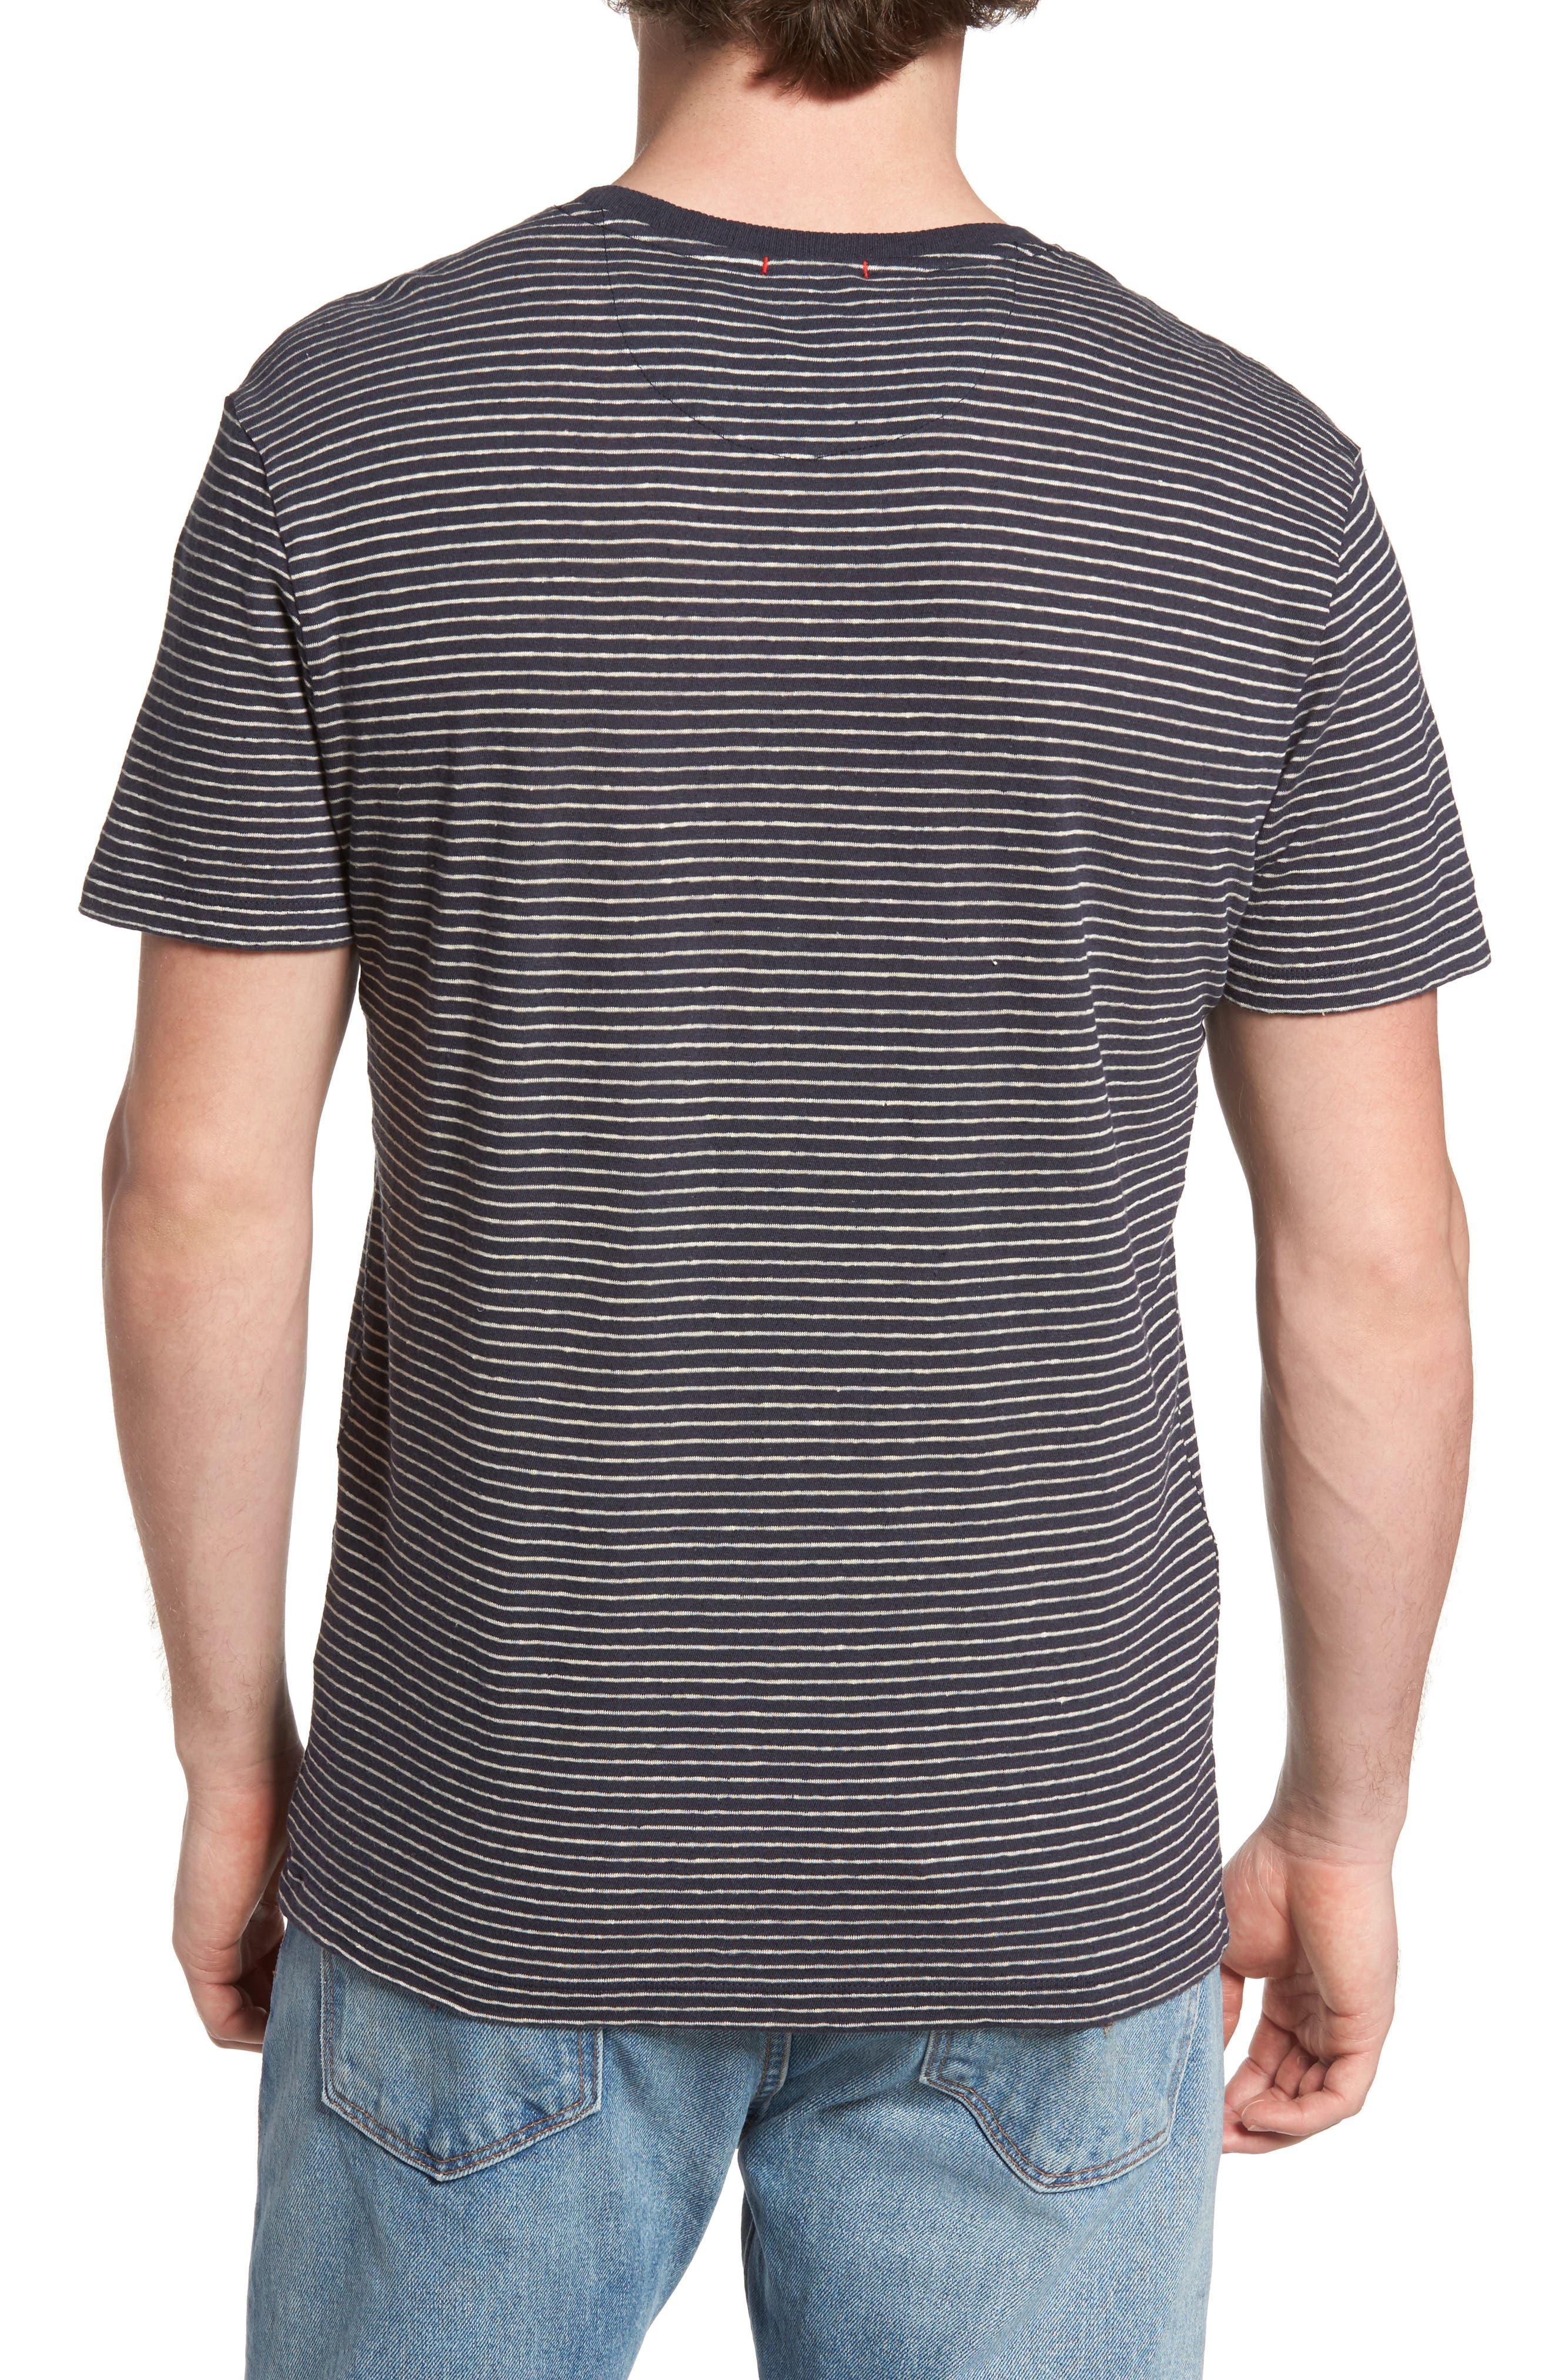 John Rich Stripe Cotton & Linen T-Shirt,                             Alternate thumbnail 2, color,                             460